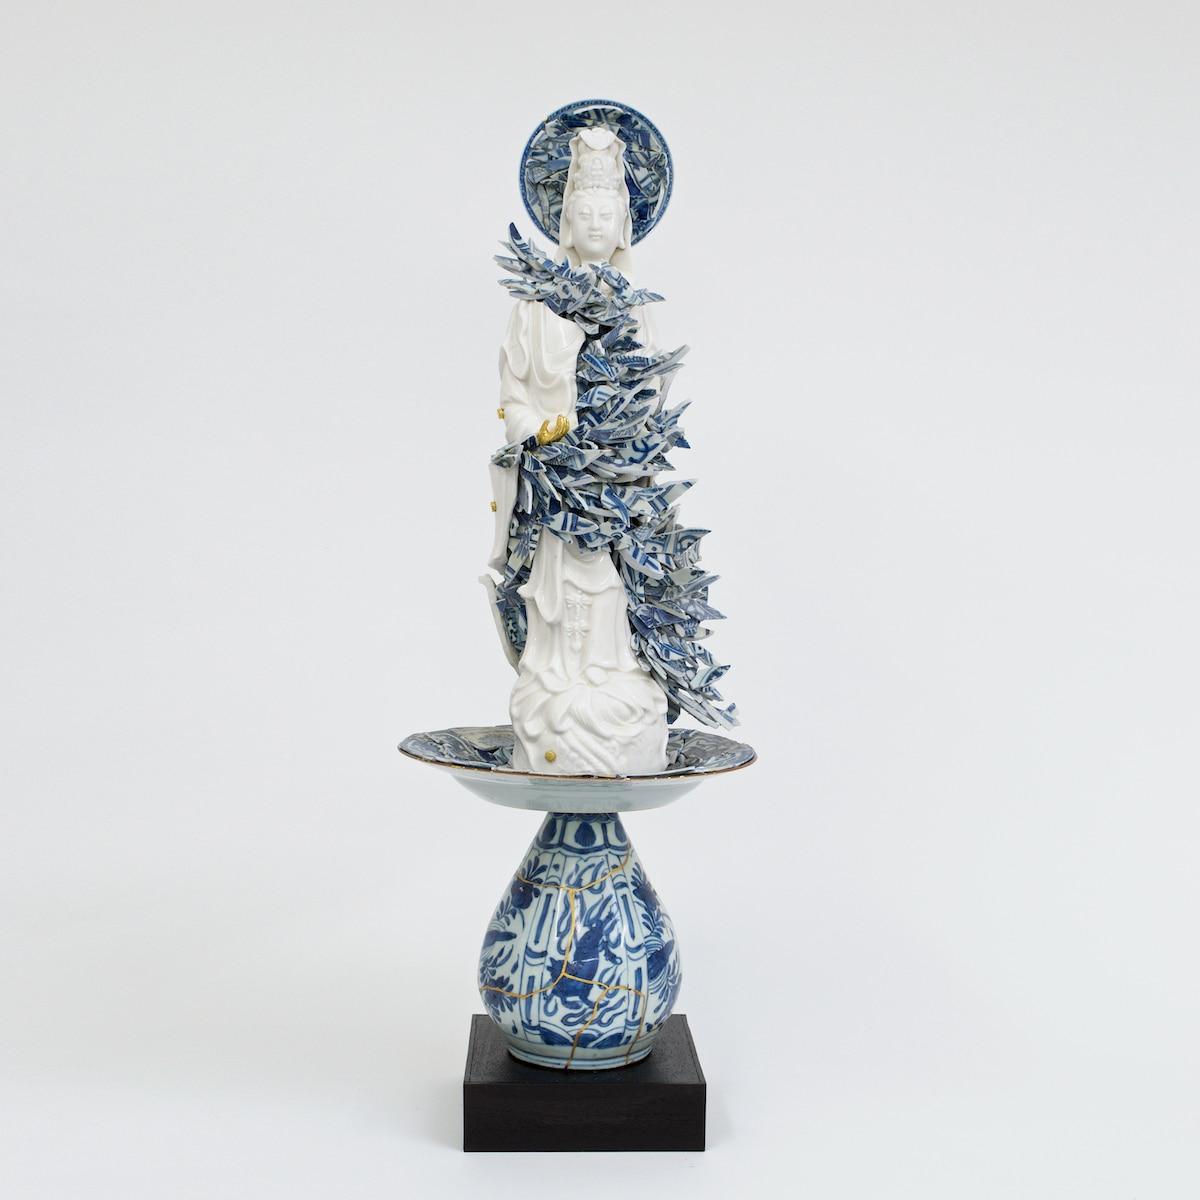 Bouke de Vries Guan Yin in a Cloud of Shards Ceramic Fragmented Sculpture